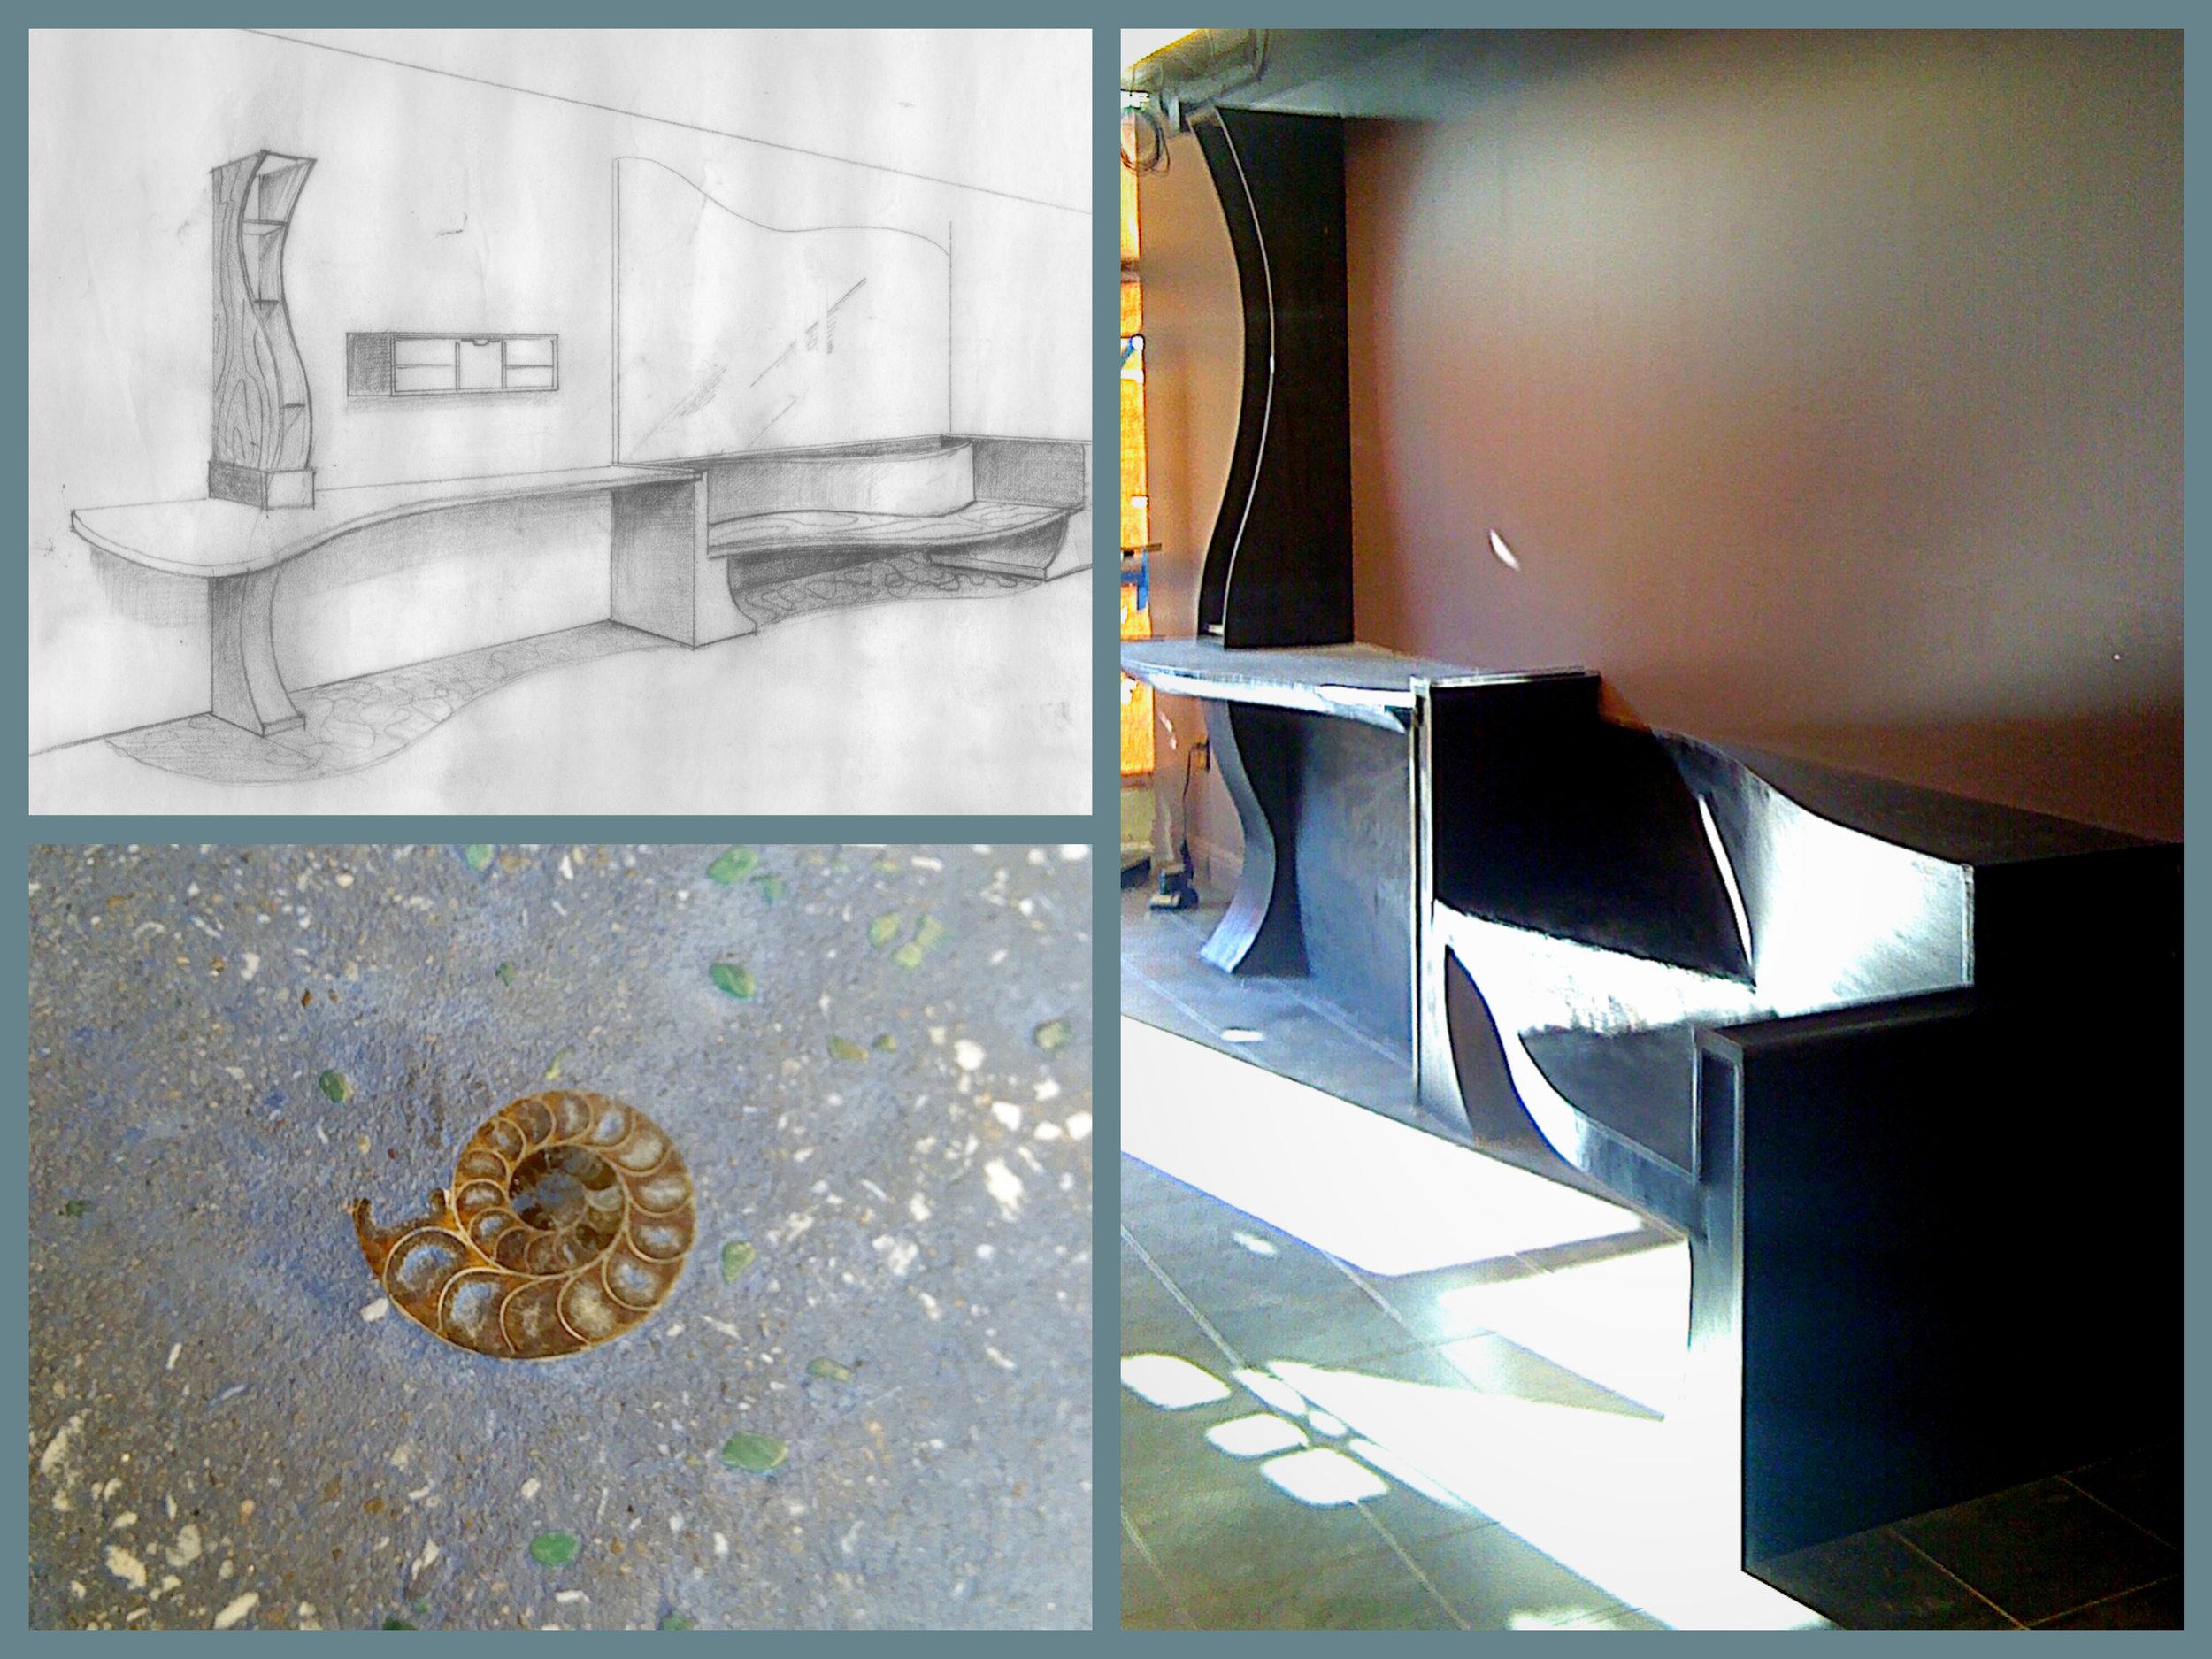 Pic_0817_009_Fotor_Collage.jpg